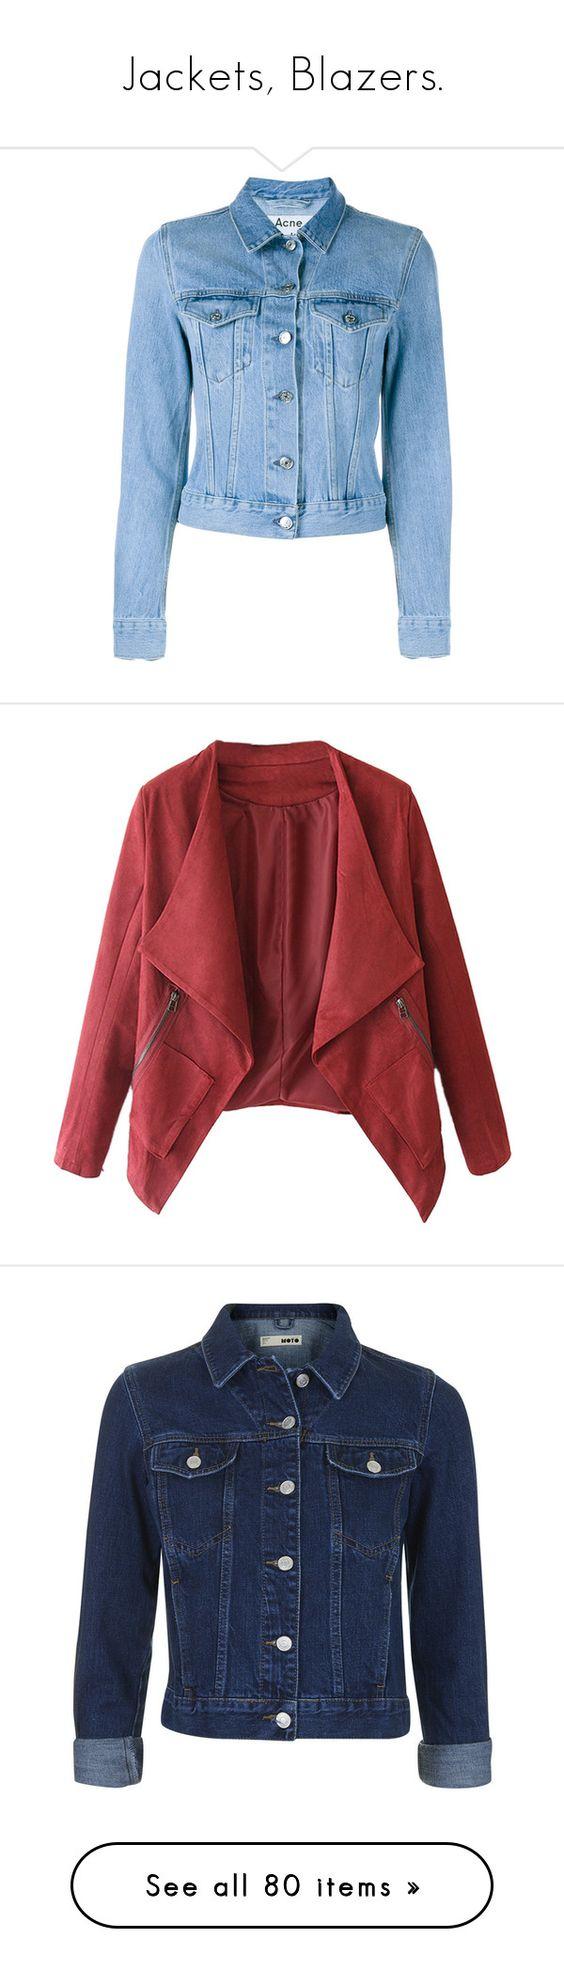 """Jackets, Blazers."" by aylin-schroeder on Polyvore featuring outerwear, jackets, tops, denim jacket, coats, long sleeve jean jacket, jean jacket, long sleeve denim jacket, acne studios und blazers"